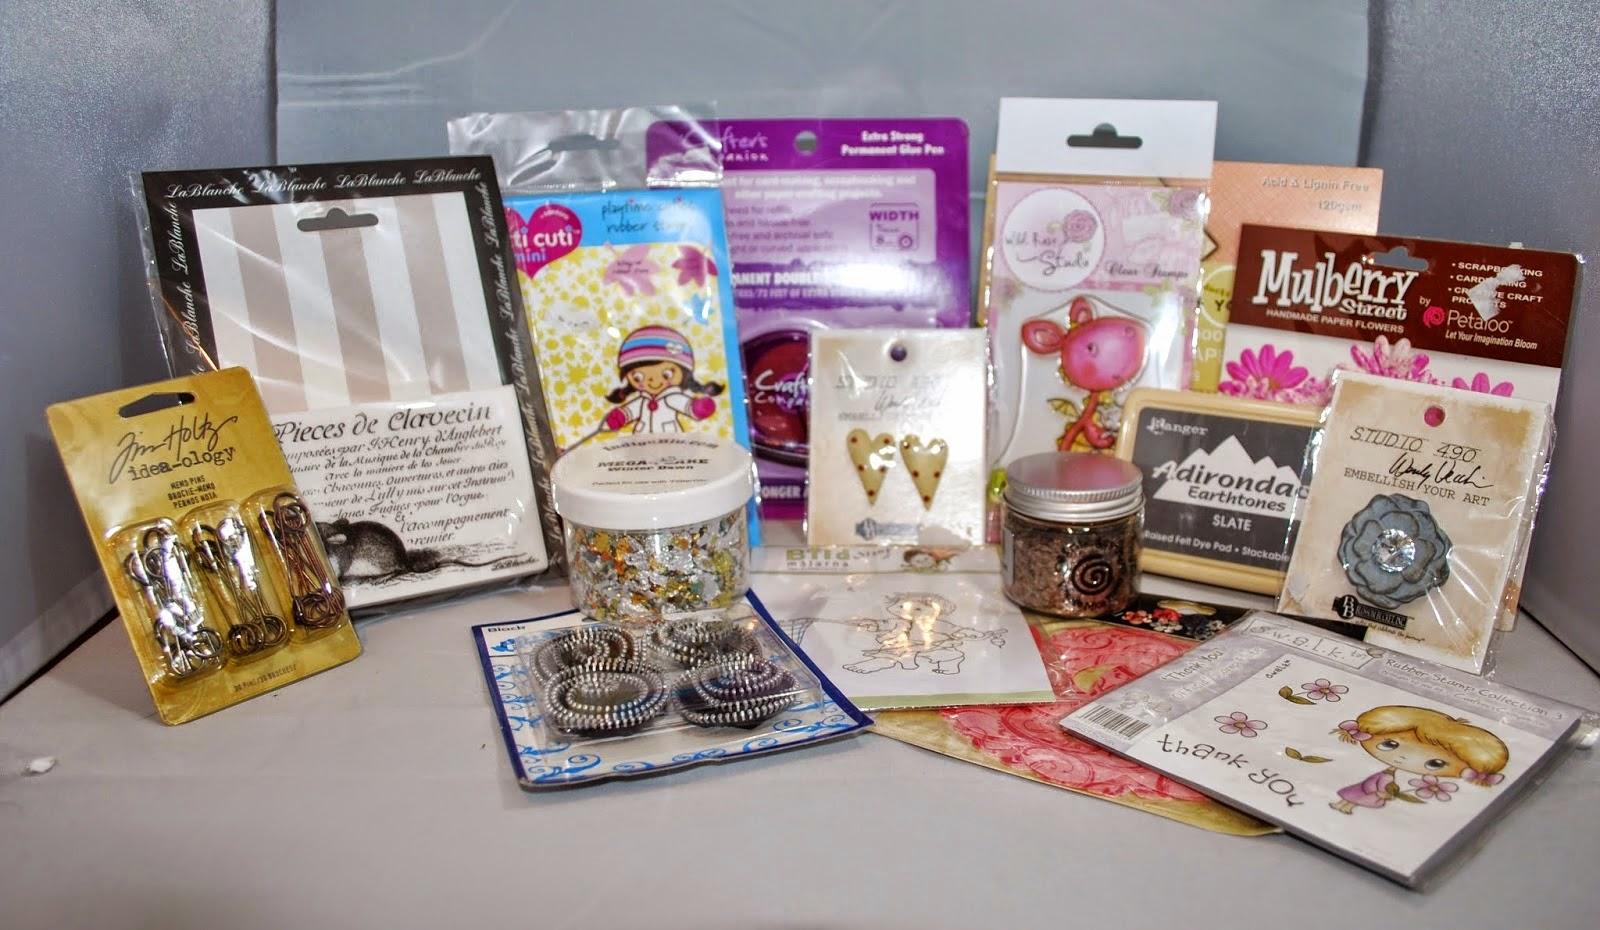 Ladybug Crafts Blog Candy until 7th Jan